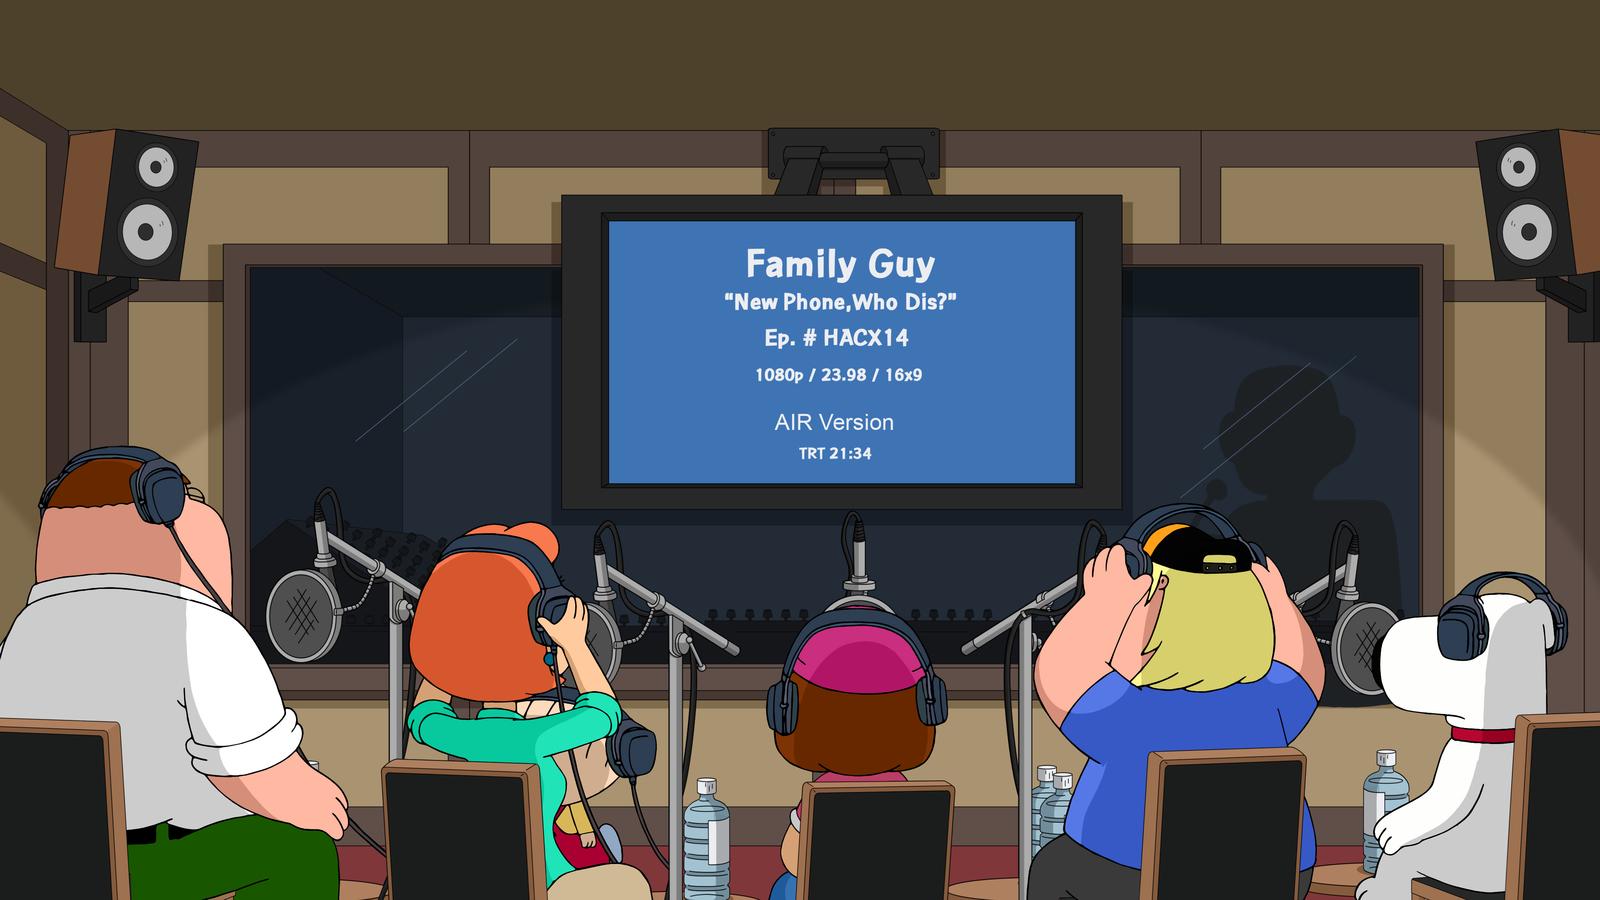 Seth Green, Alex Borstein, and Seth MacFarlane in Family Guy (1999)